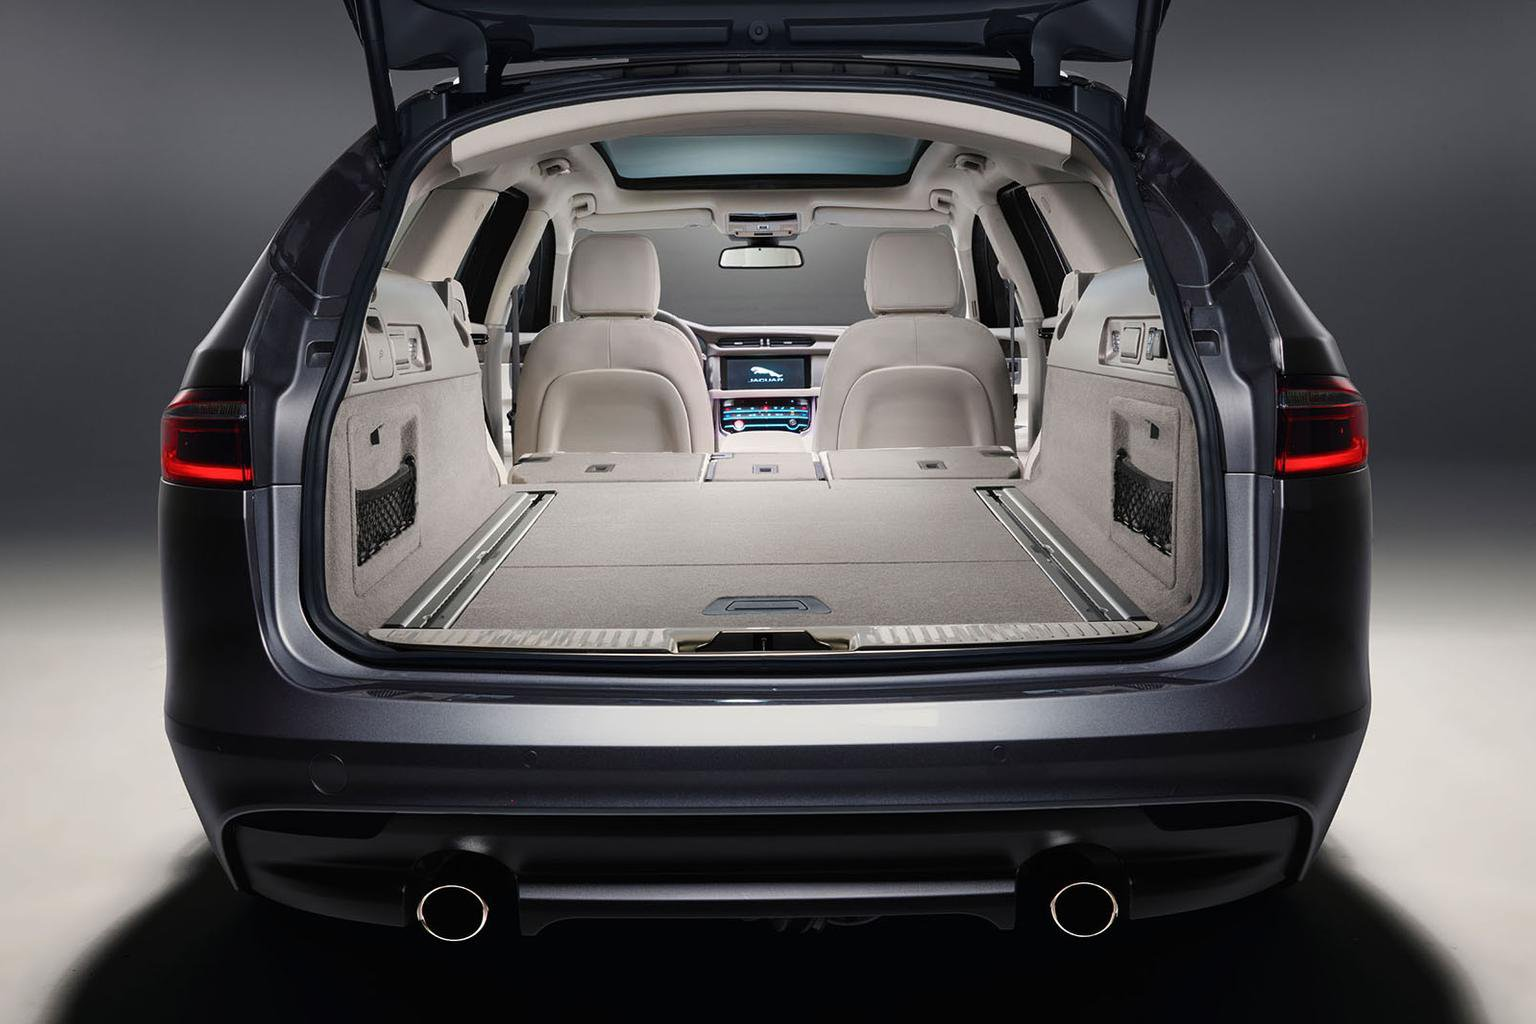 New Jaguar XF Sportbrake in pictures